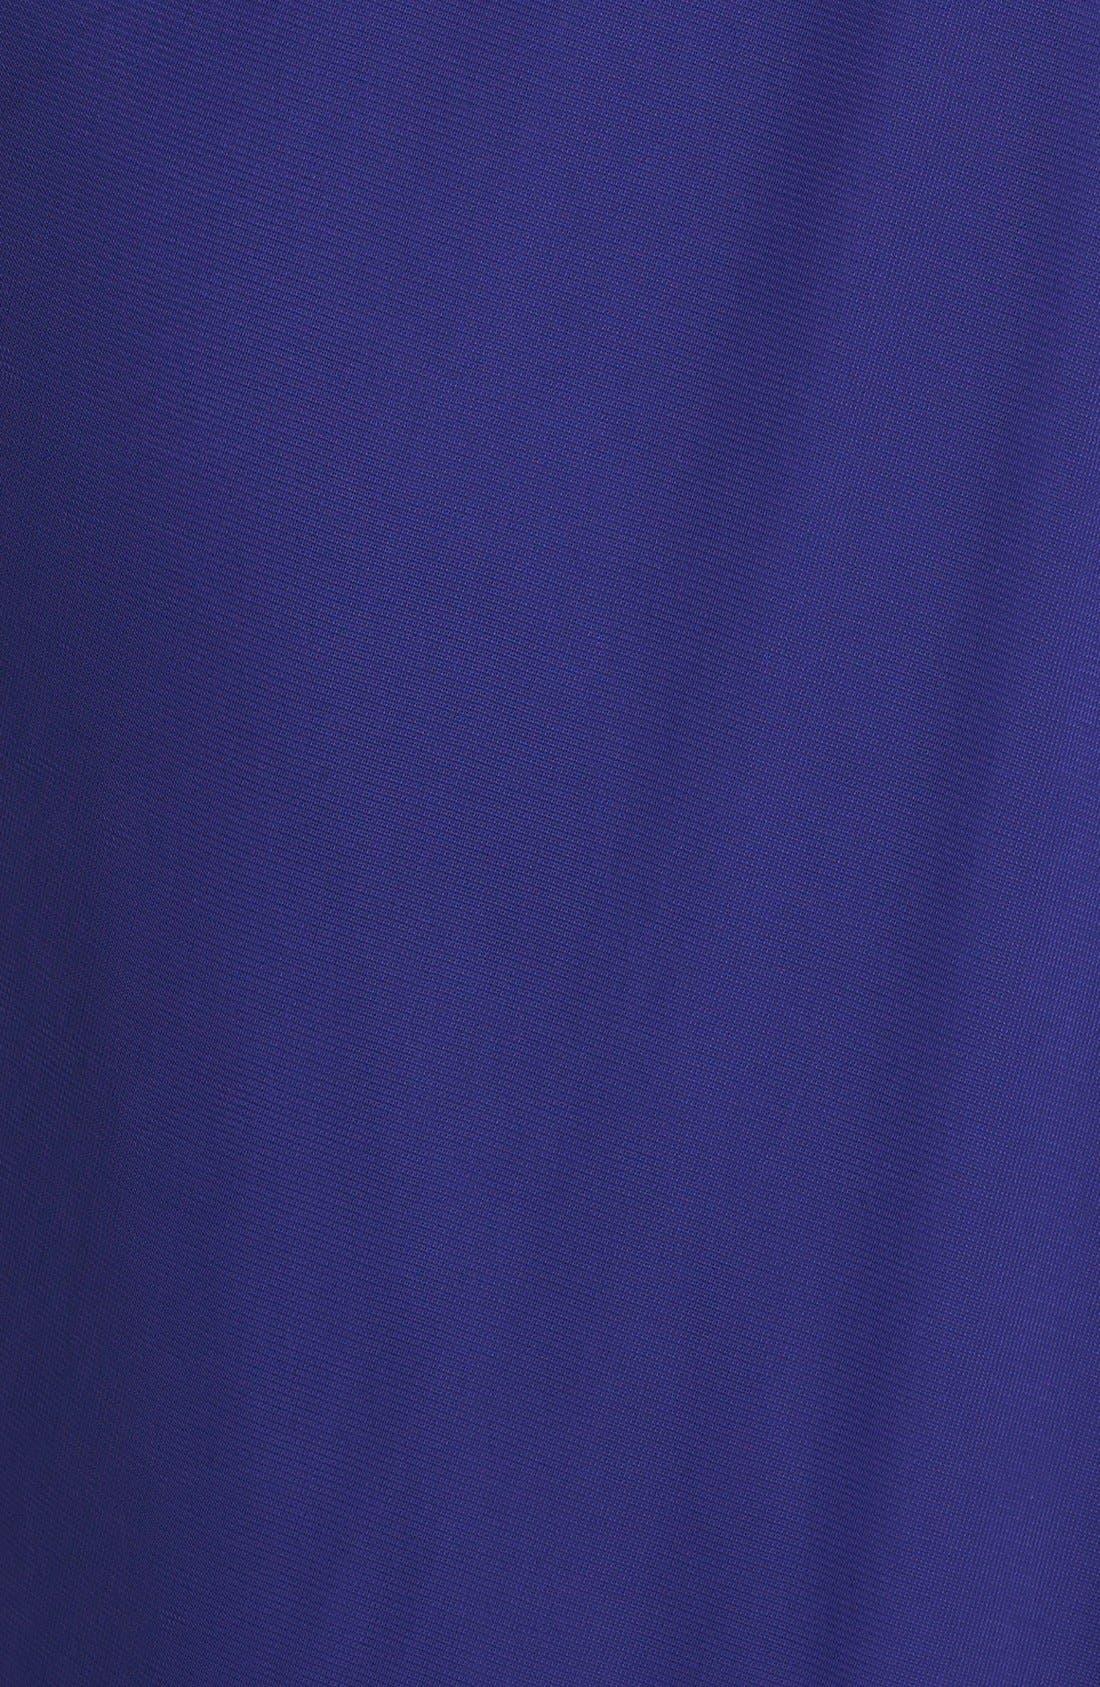 Alternate Image 3  - Adrianna Papell Draped Chiffon Gown (Petite)